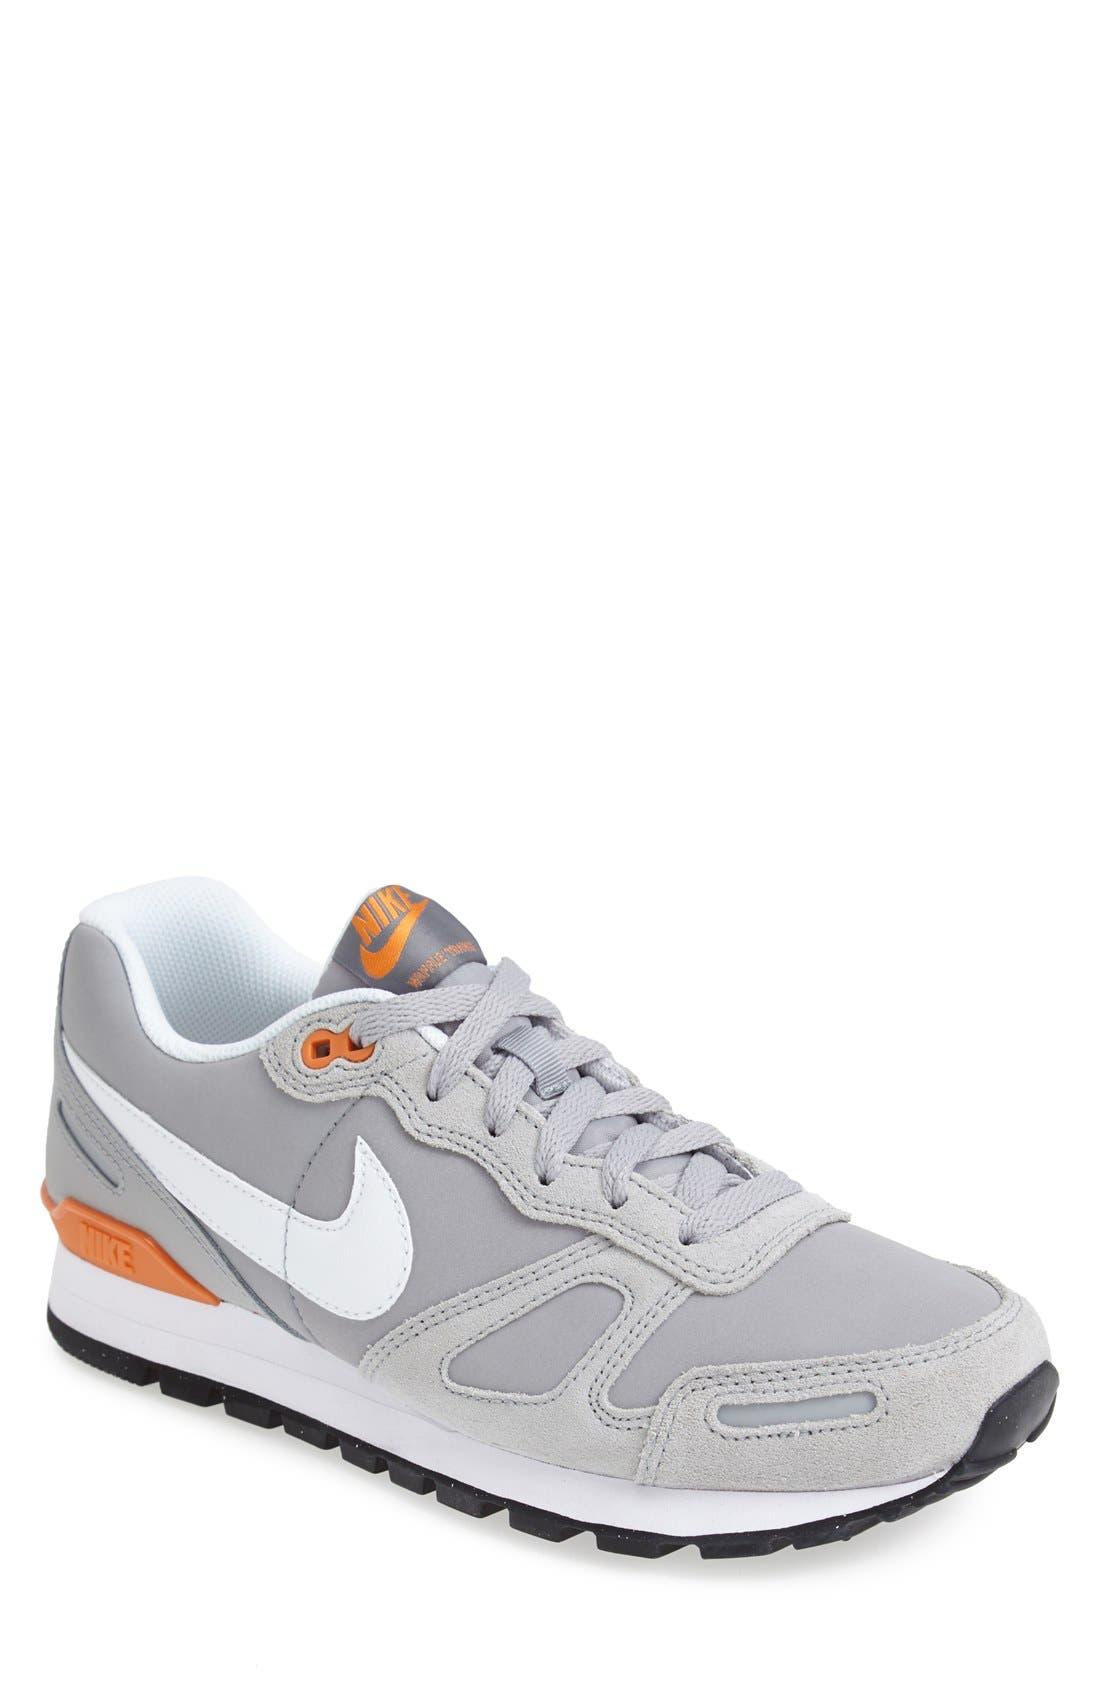 NIKE,                             'Air Waffle Trainer' Sneaker,                             Main thumbnail 1, color,                             062